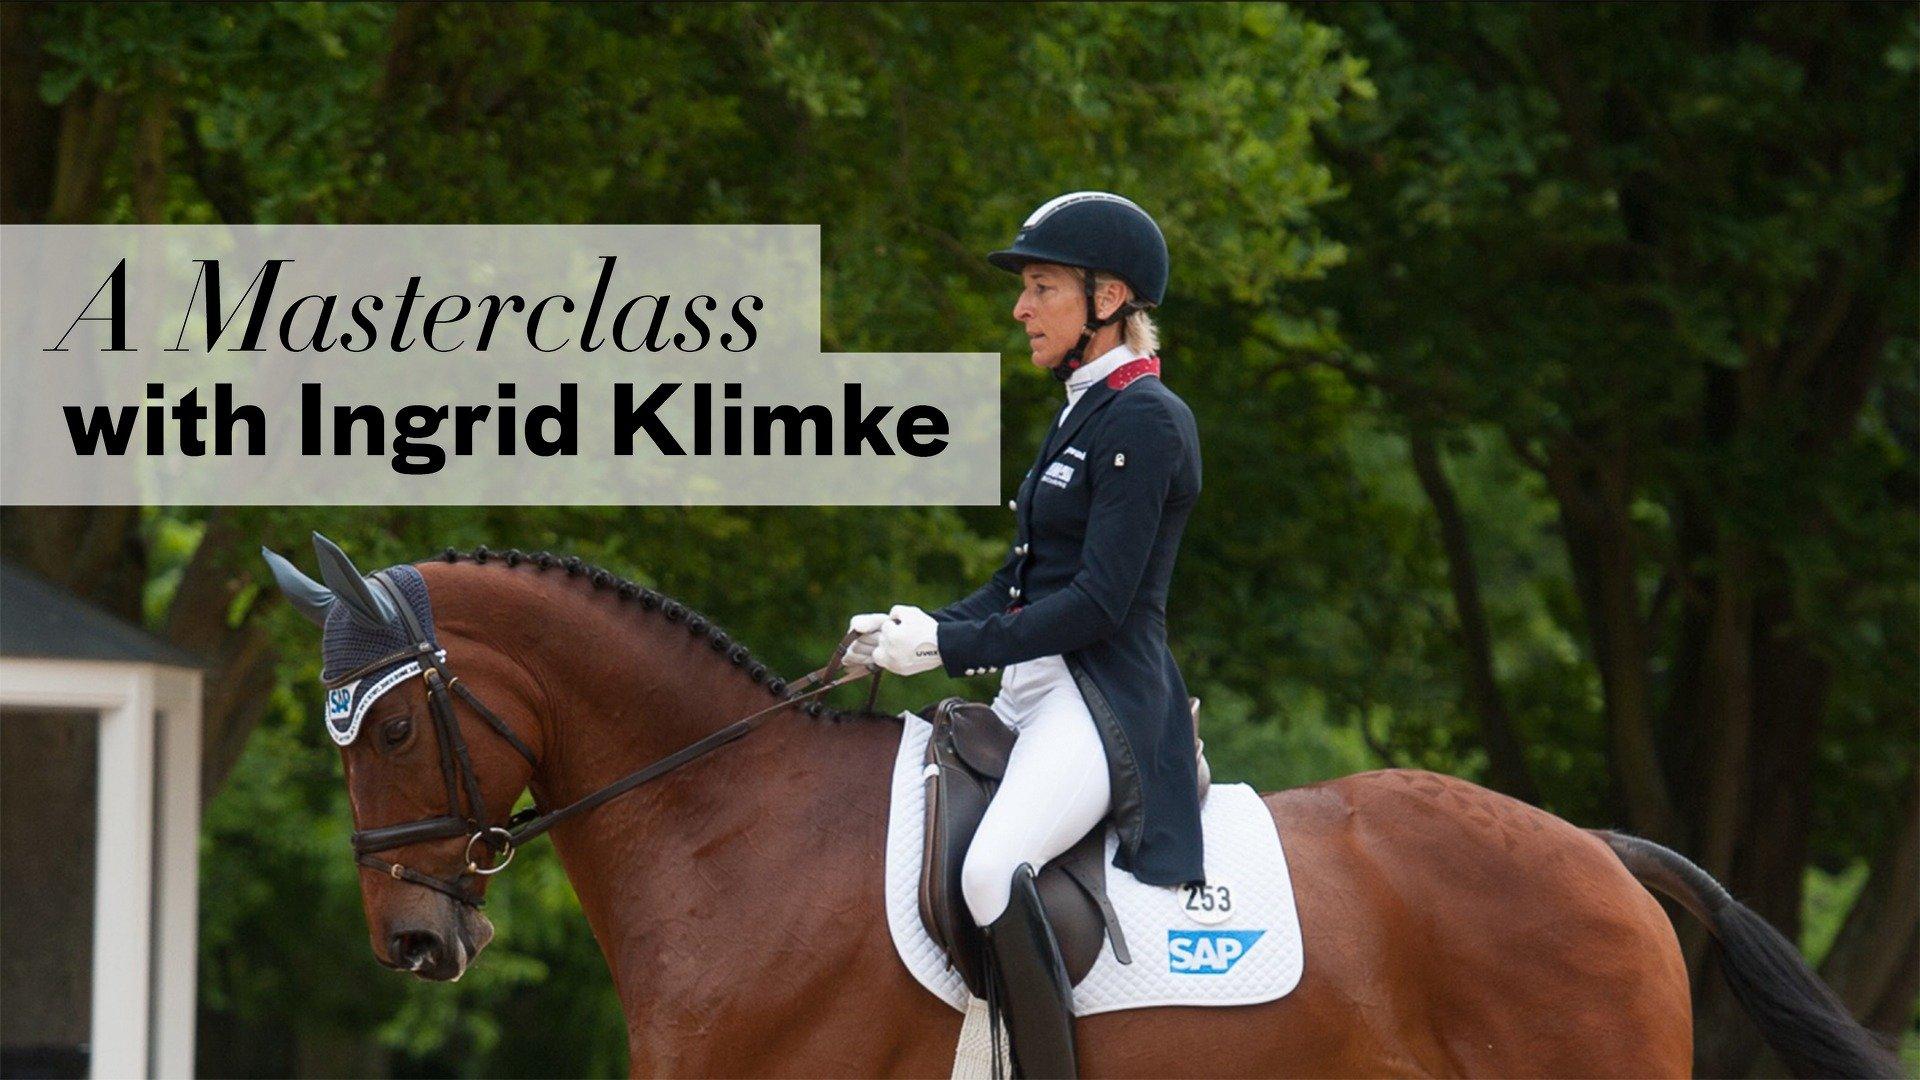 A Masterclass with Ingrid Klimke